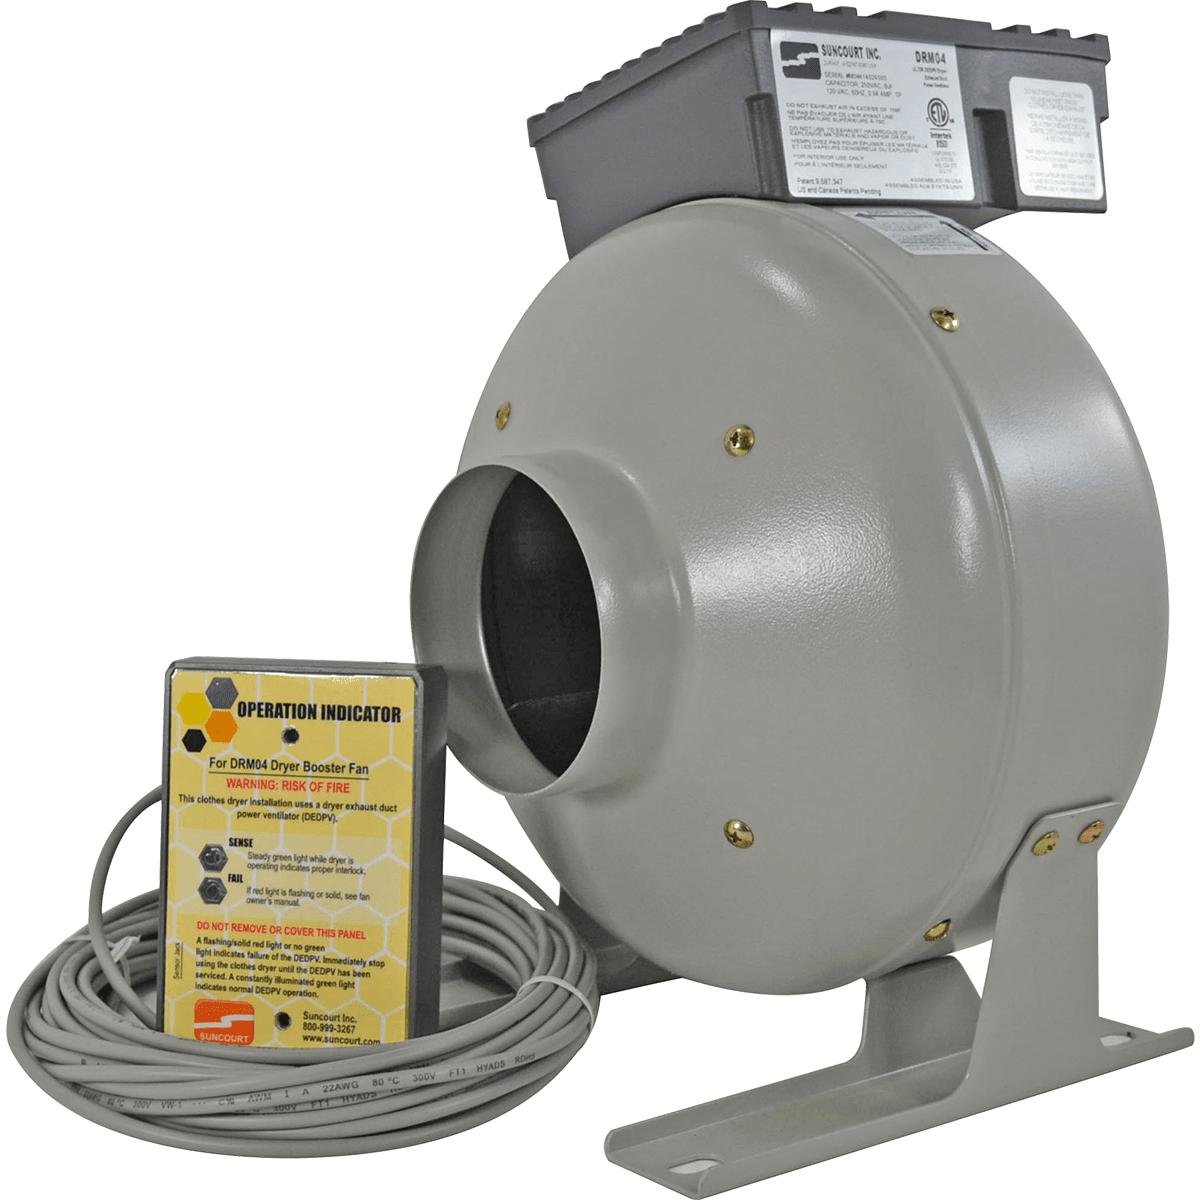 Suncourt Centrasense DEDPV Dryer Booster Fan Kit